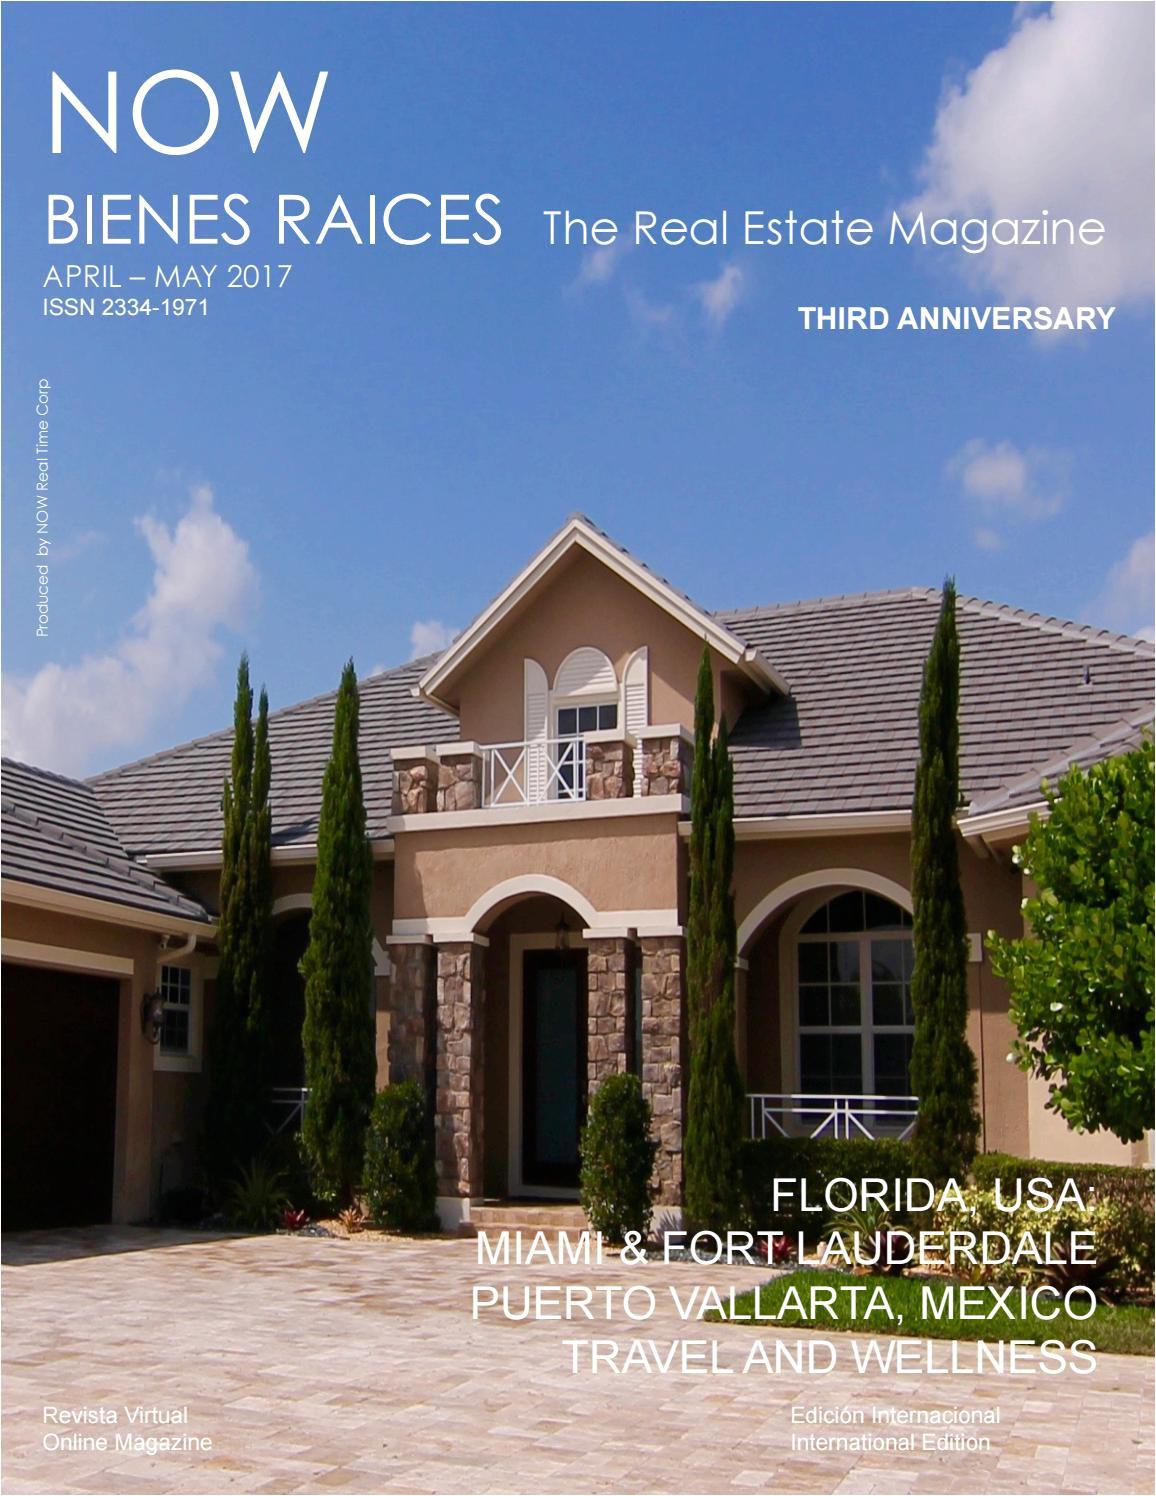 Venta De Casas En Kendall Miami Con Piscina now Bienes Raices May 2017 the Real Estate Magazine by now Real Time